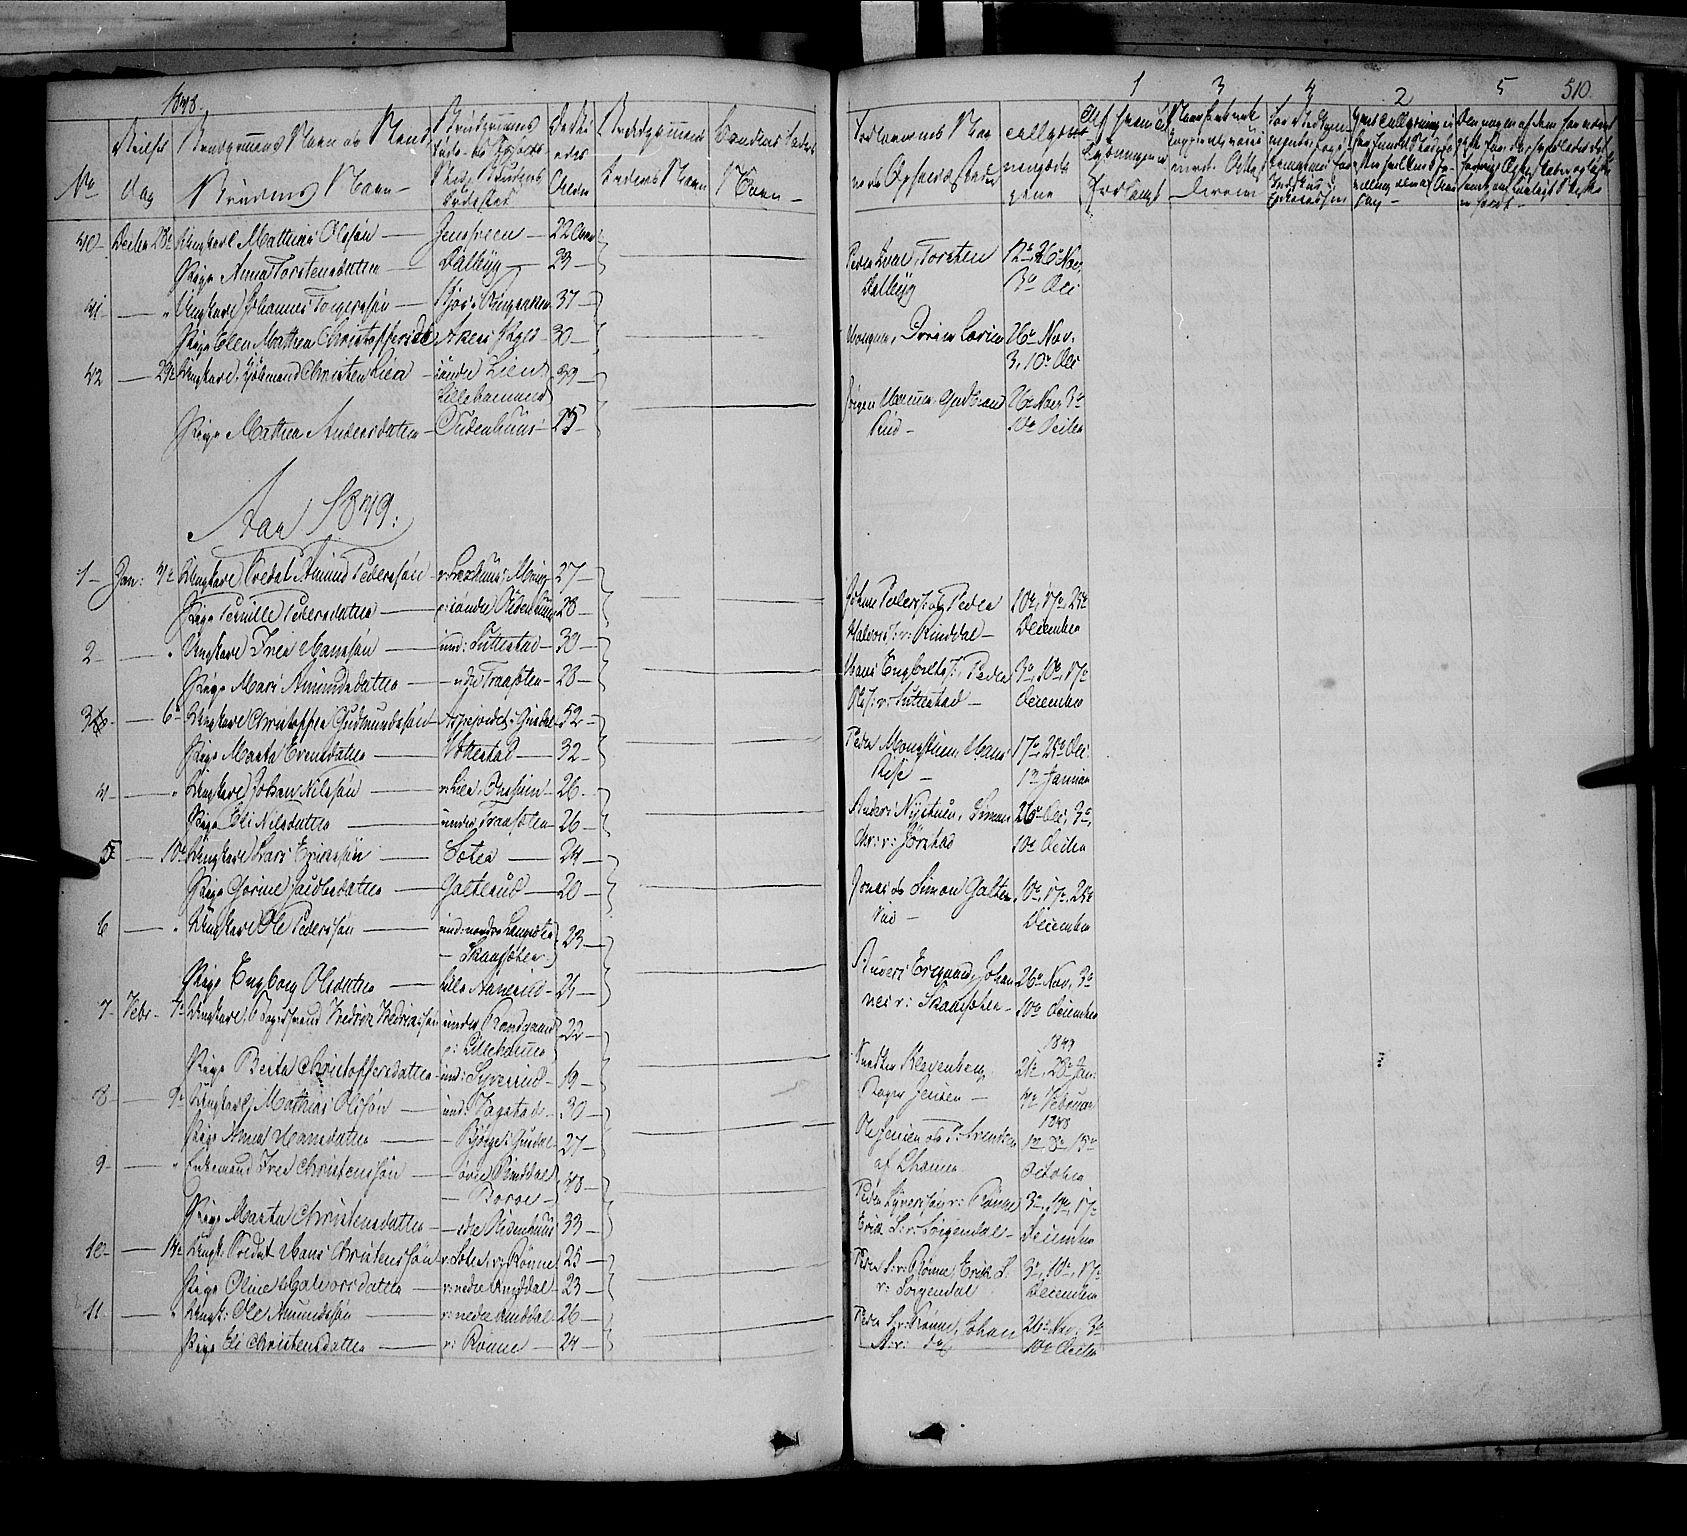 SAH, Fåberg prestekontor, Ministerialbok nr. 5, 1836-1854, s. 509-510